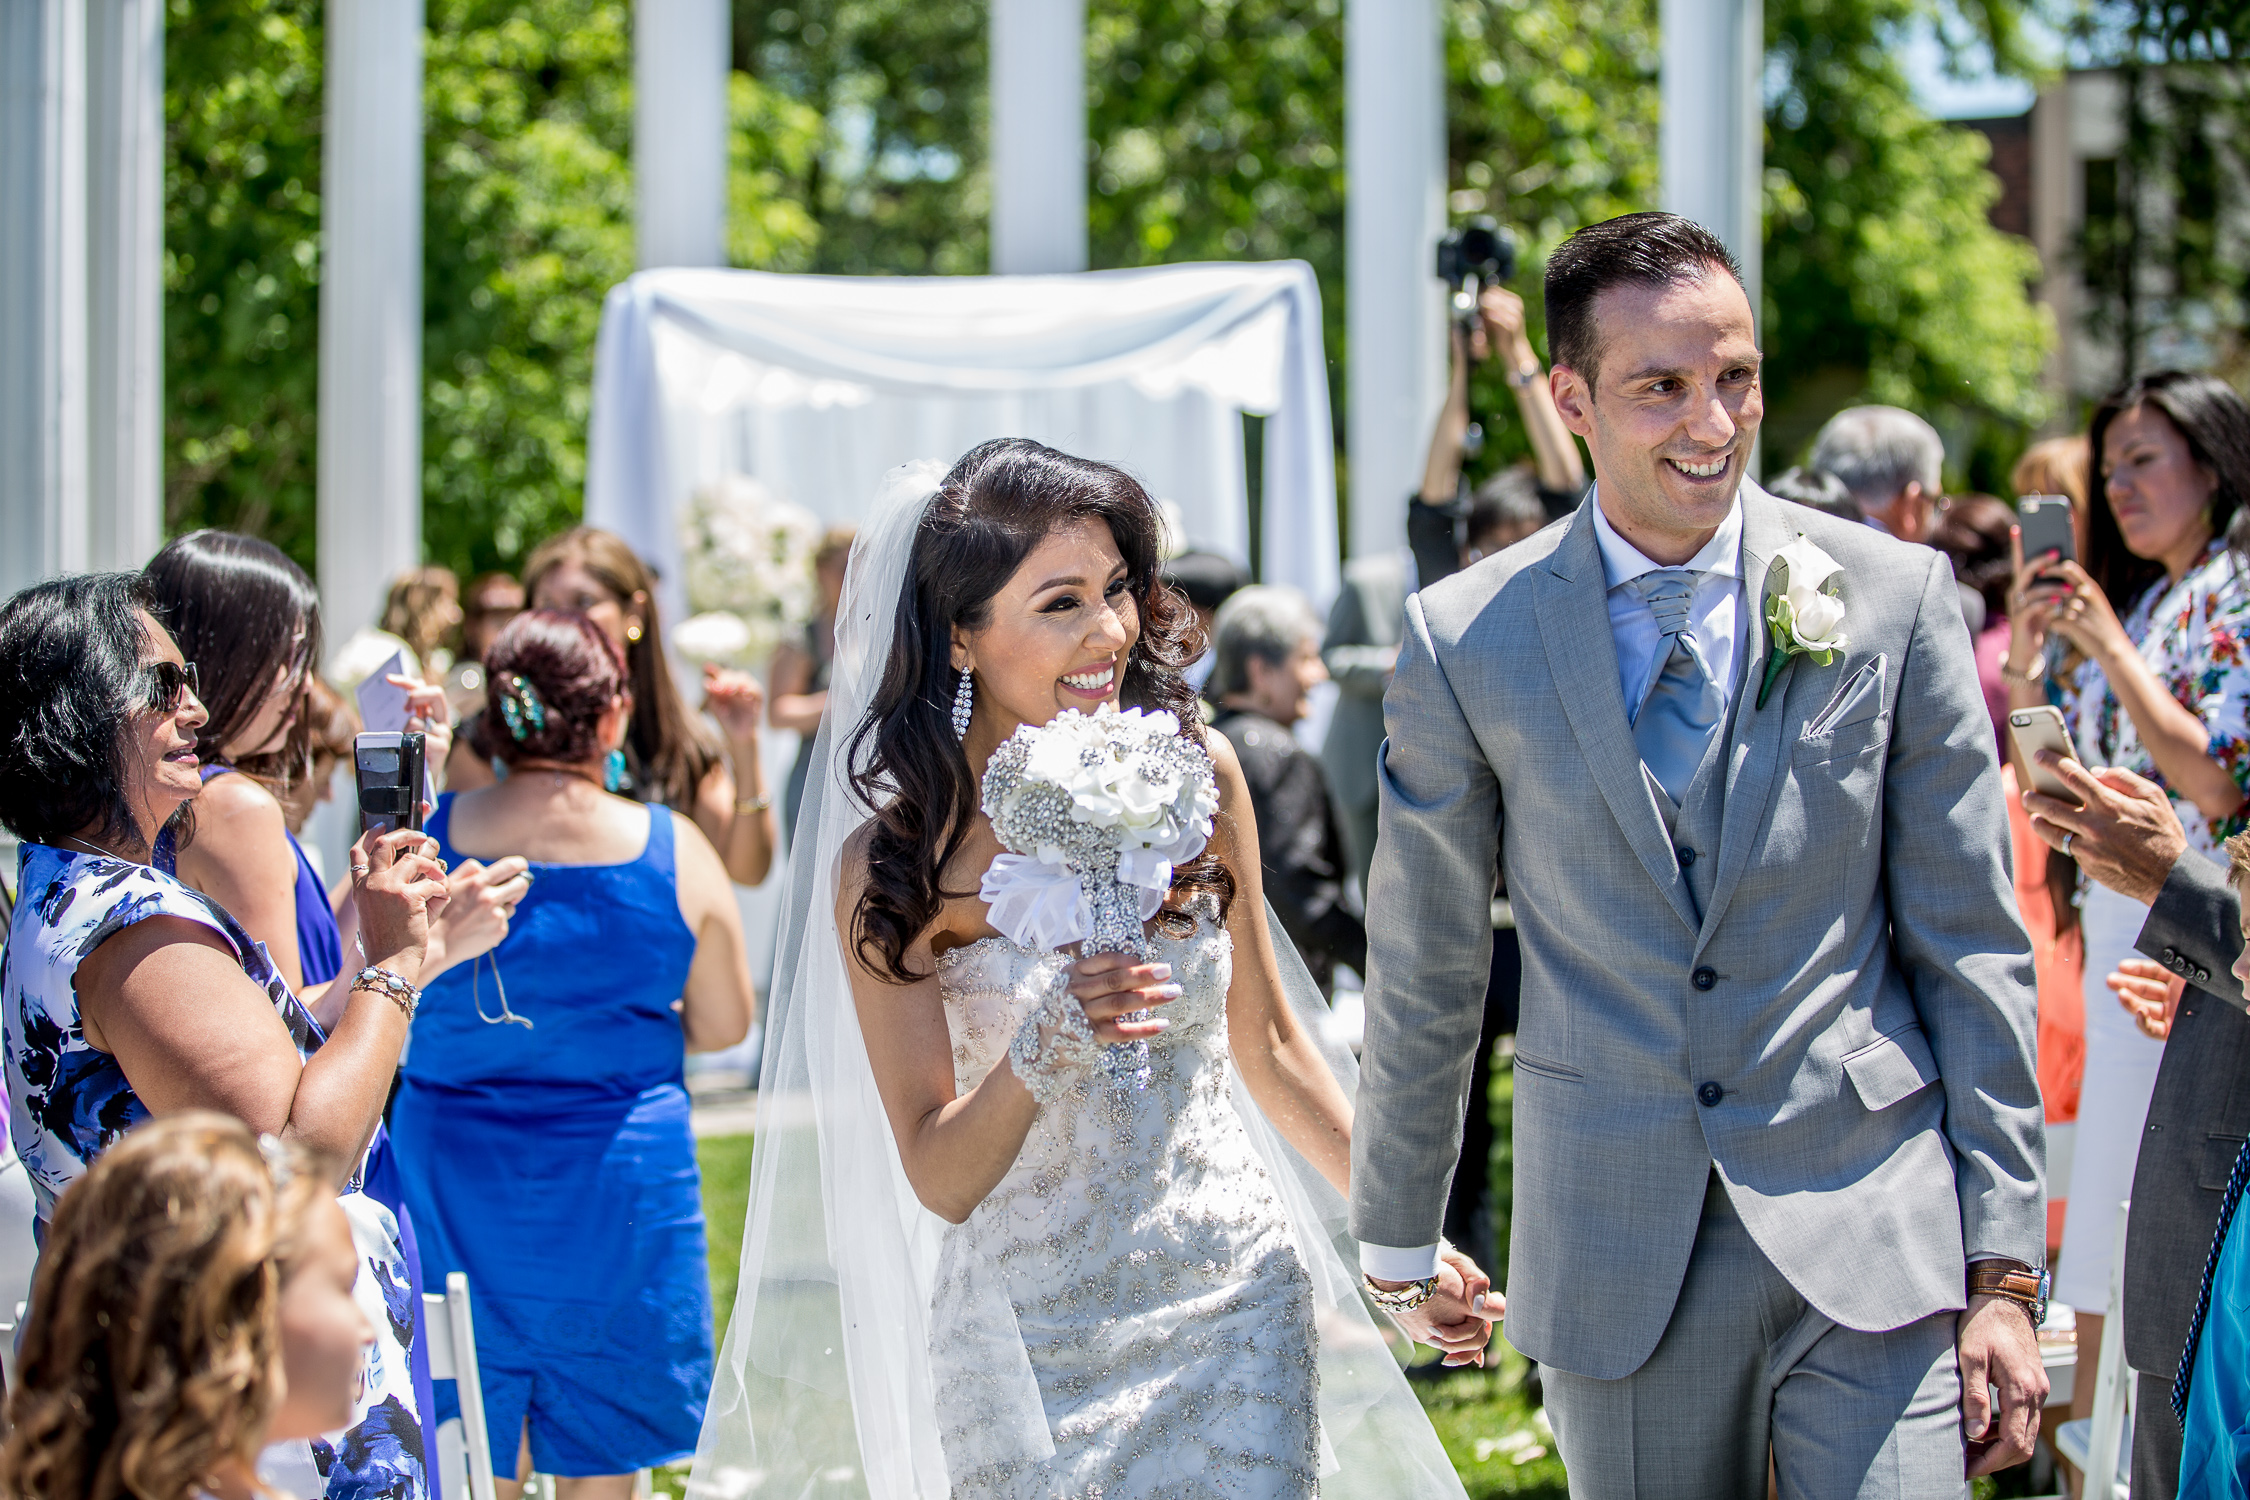 Paradise-Banquet-Hall-Wedding-Vaughan-Ontario-0052.jpg